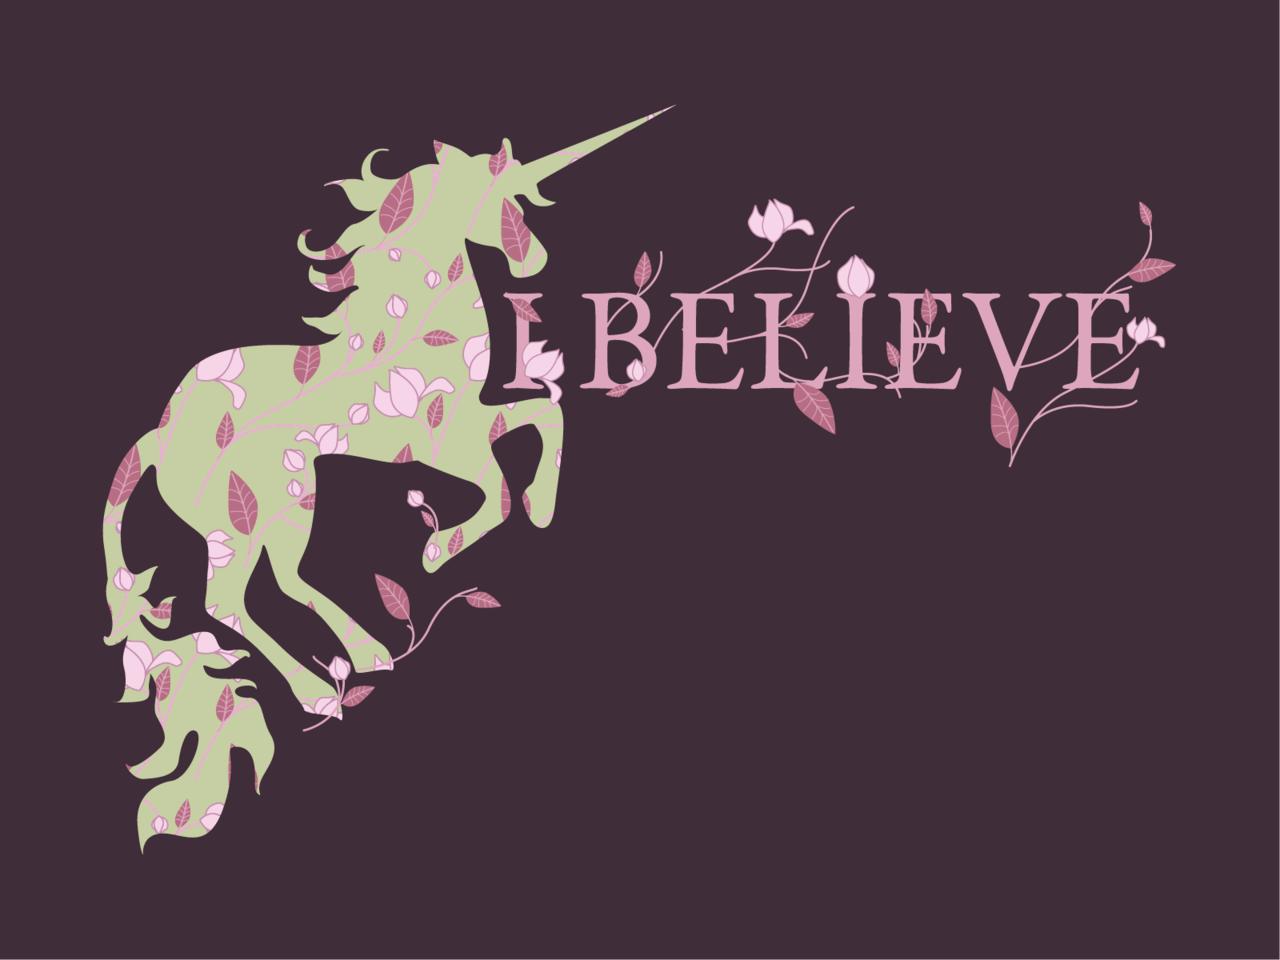 Originalmeaningofalternative Unicorn Backgrounds Unicorn Wallpaper Unicorn